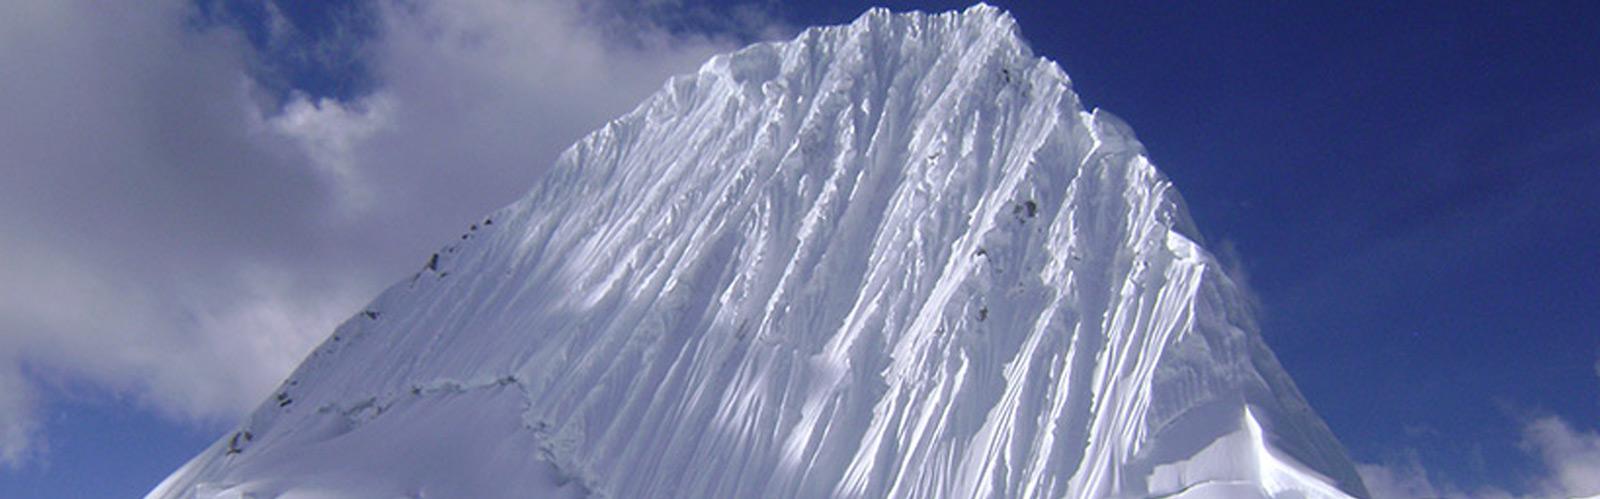 Alpamayo Climbing Peru 5,947m Cordillera Blanca Expeditions